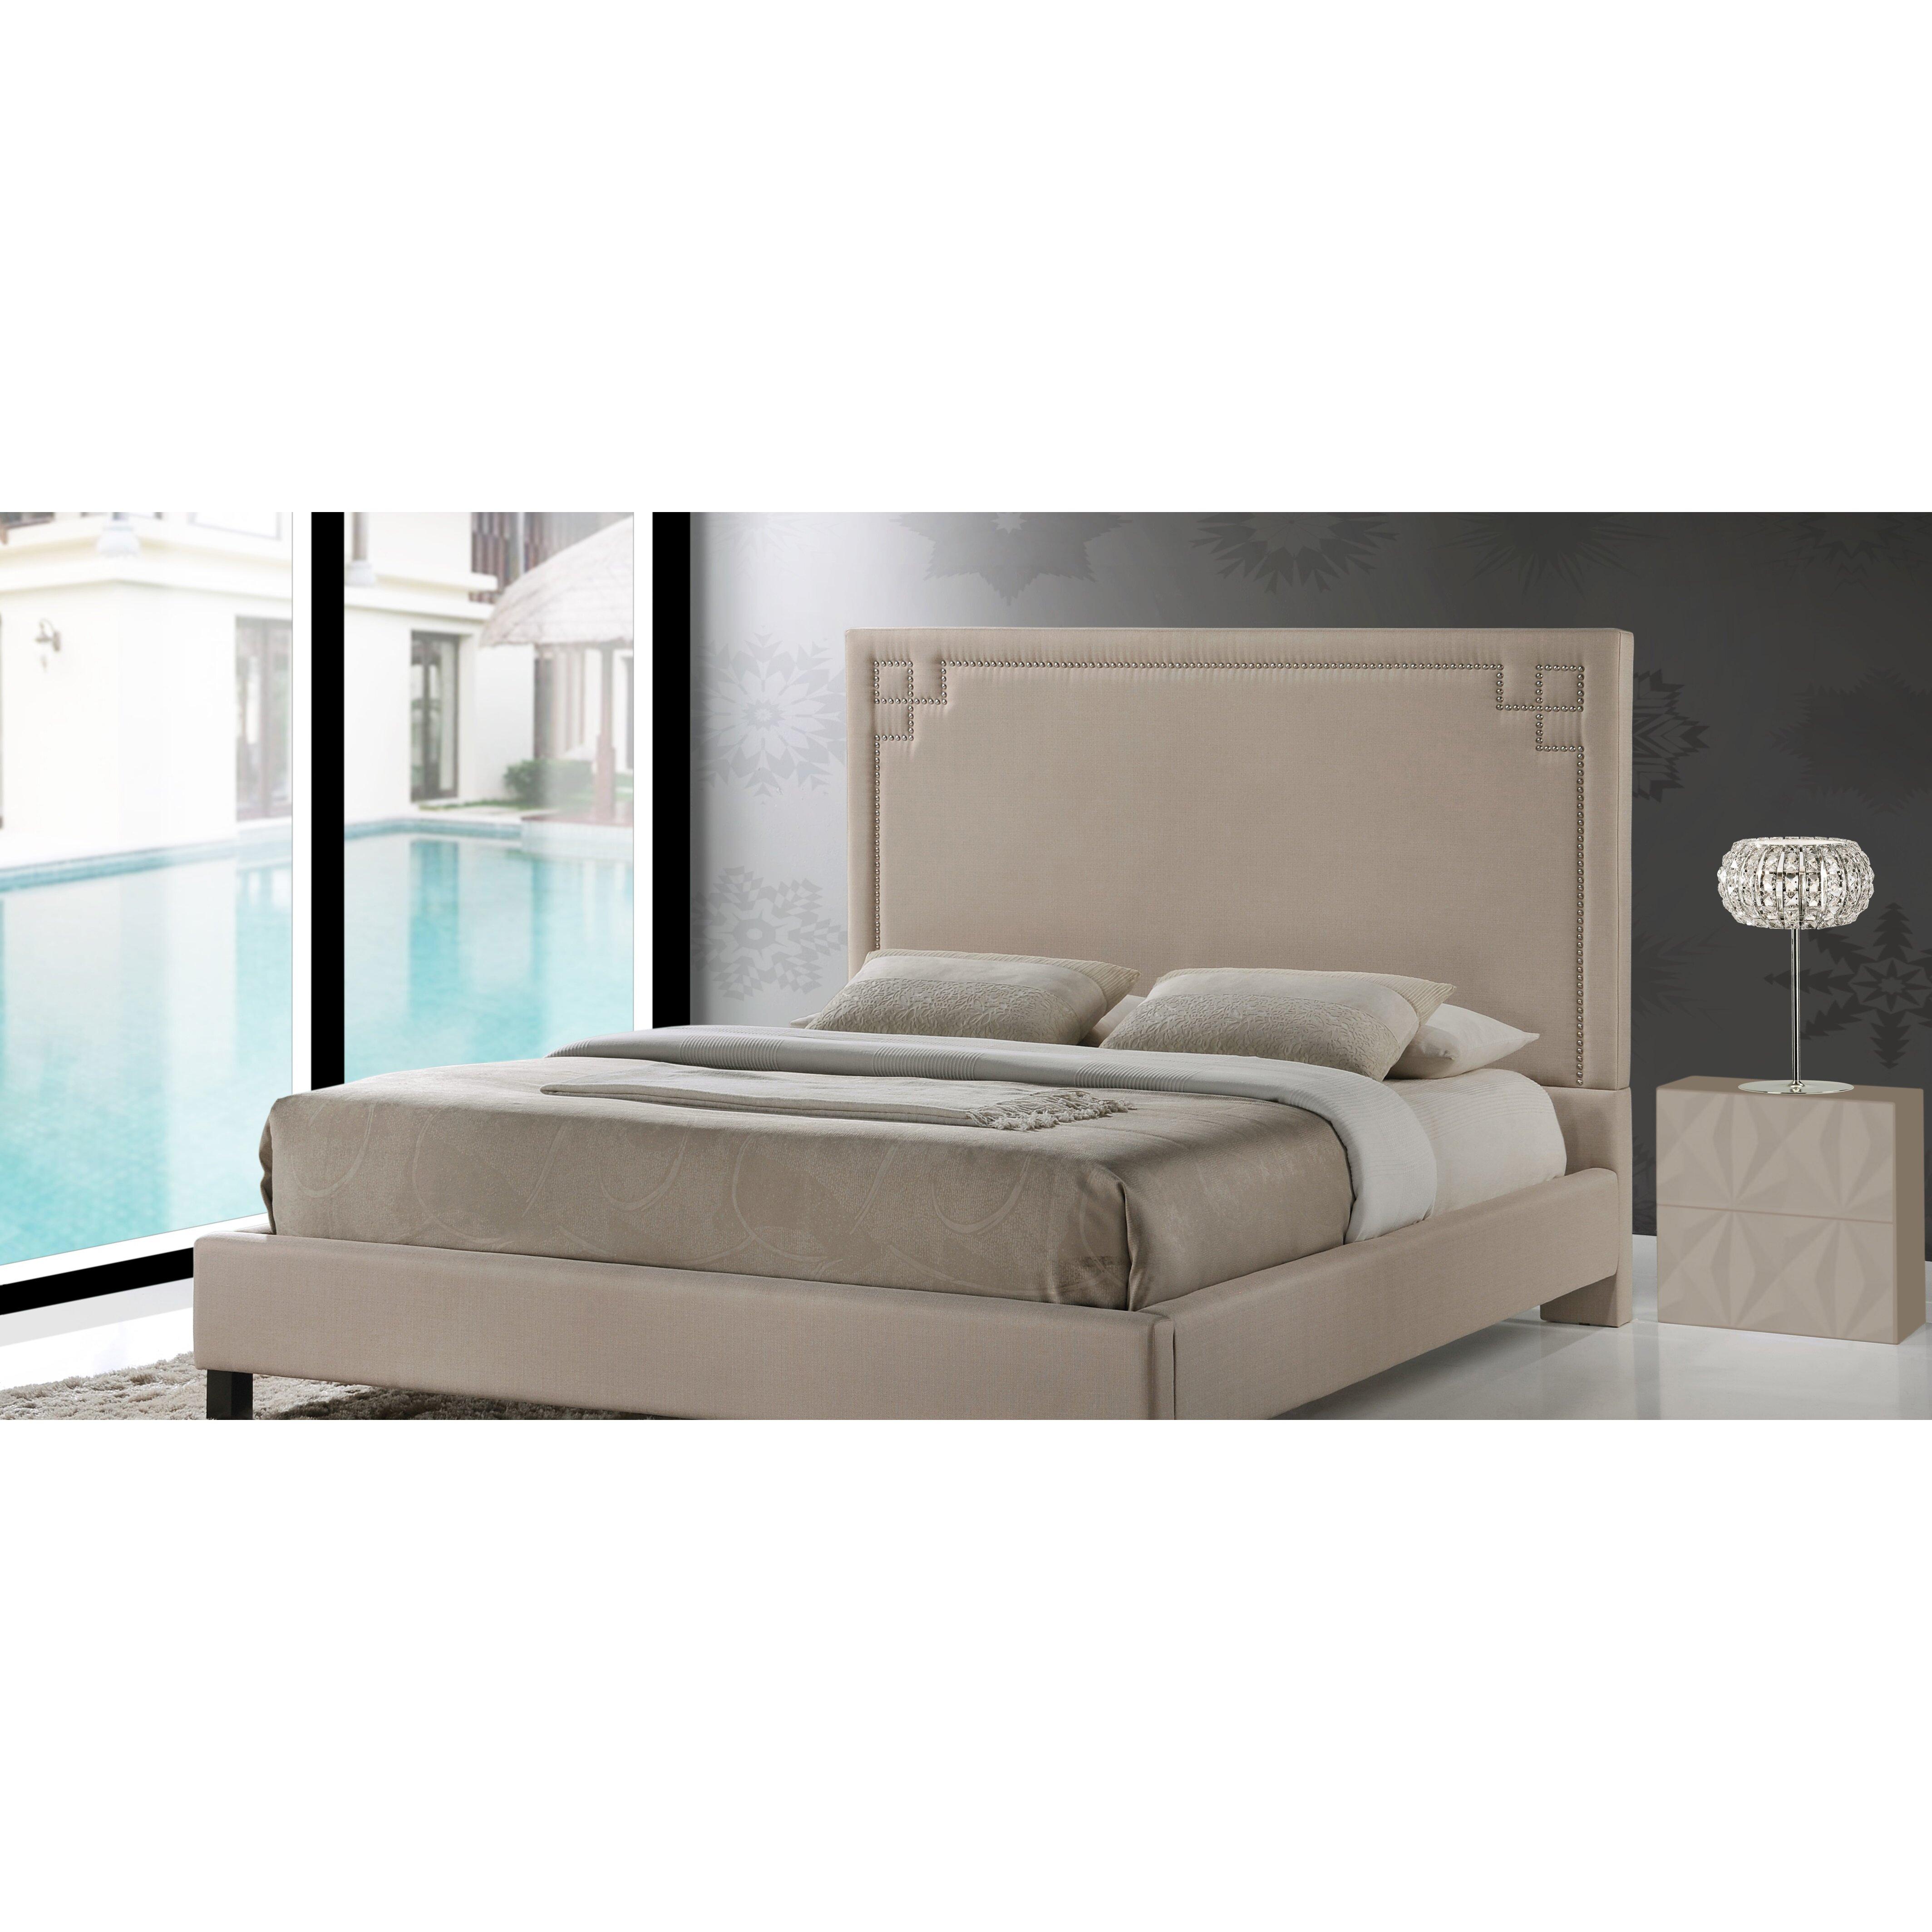 Wholesale Interiors Baxton Studio Colchester Upholstered Platform Bed